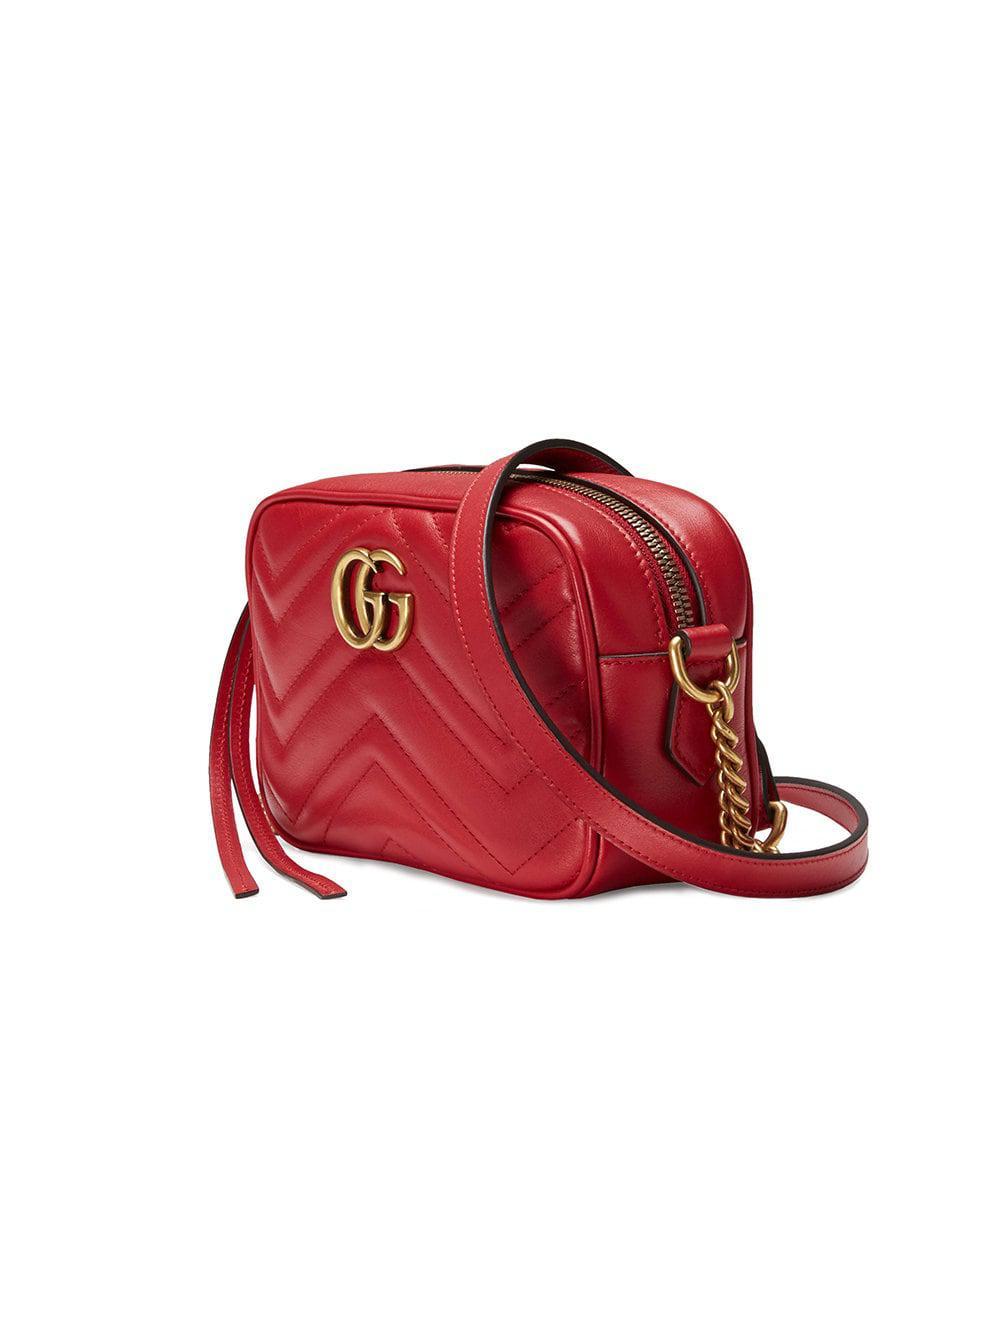 9ff2c1d9c63 Gucci - Red GG Marmont Matelassé Leather Mini Shoulder Bag - Lyst. View  fullscreen